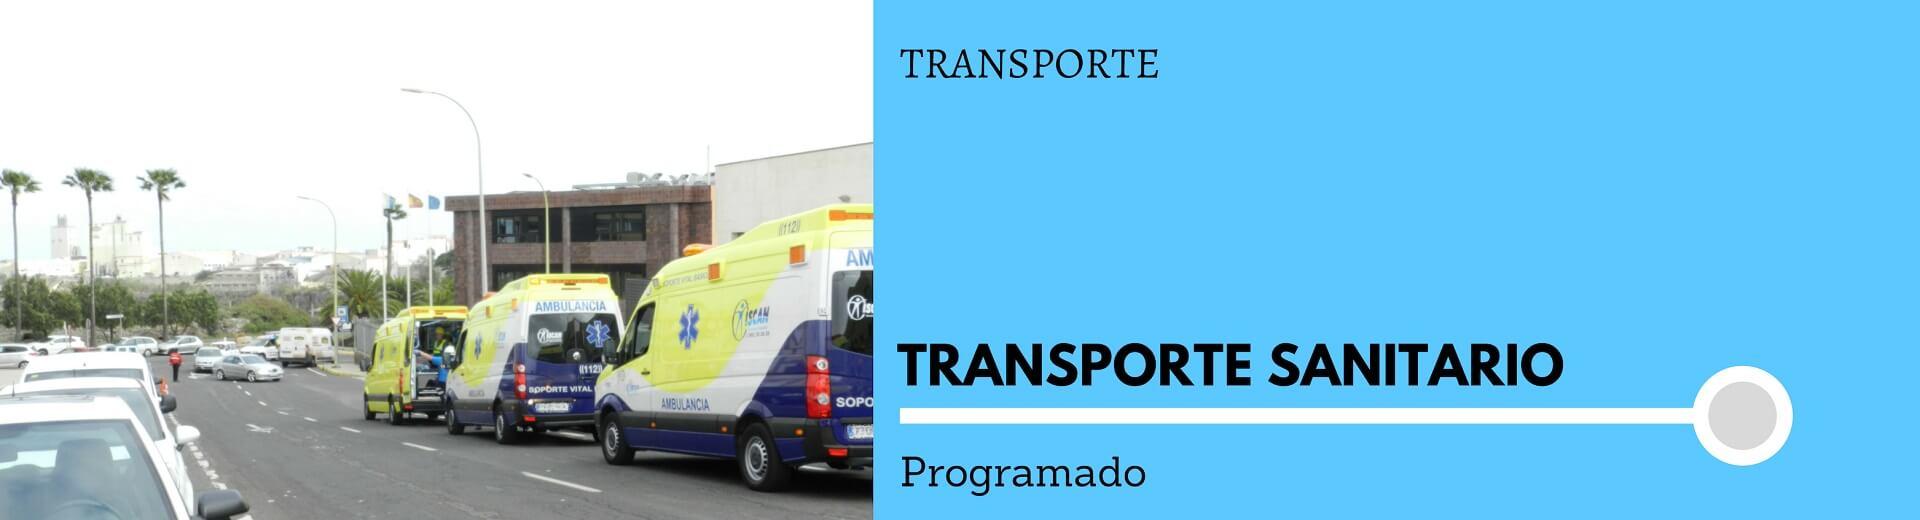 ISCAN_Transporteprogramado